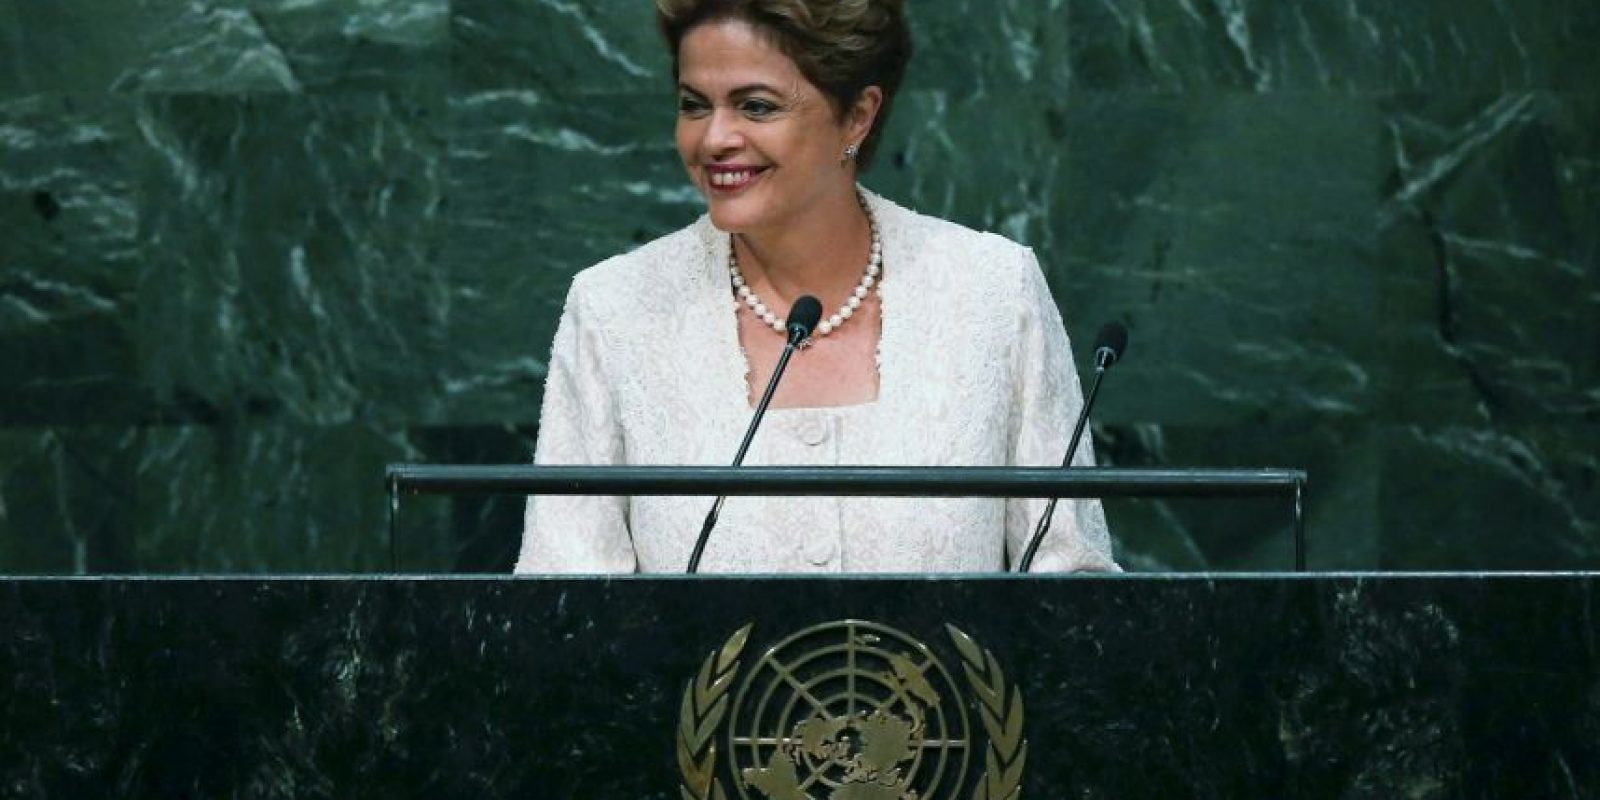 Nació en Belo Horizonte el 14 de diciembre de 1947 Foto:Getty Images